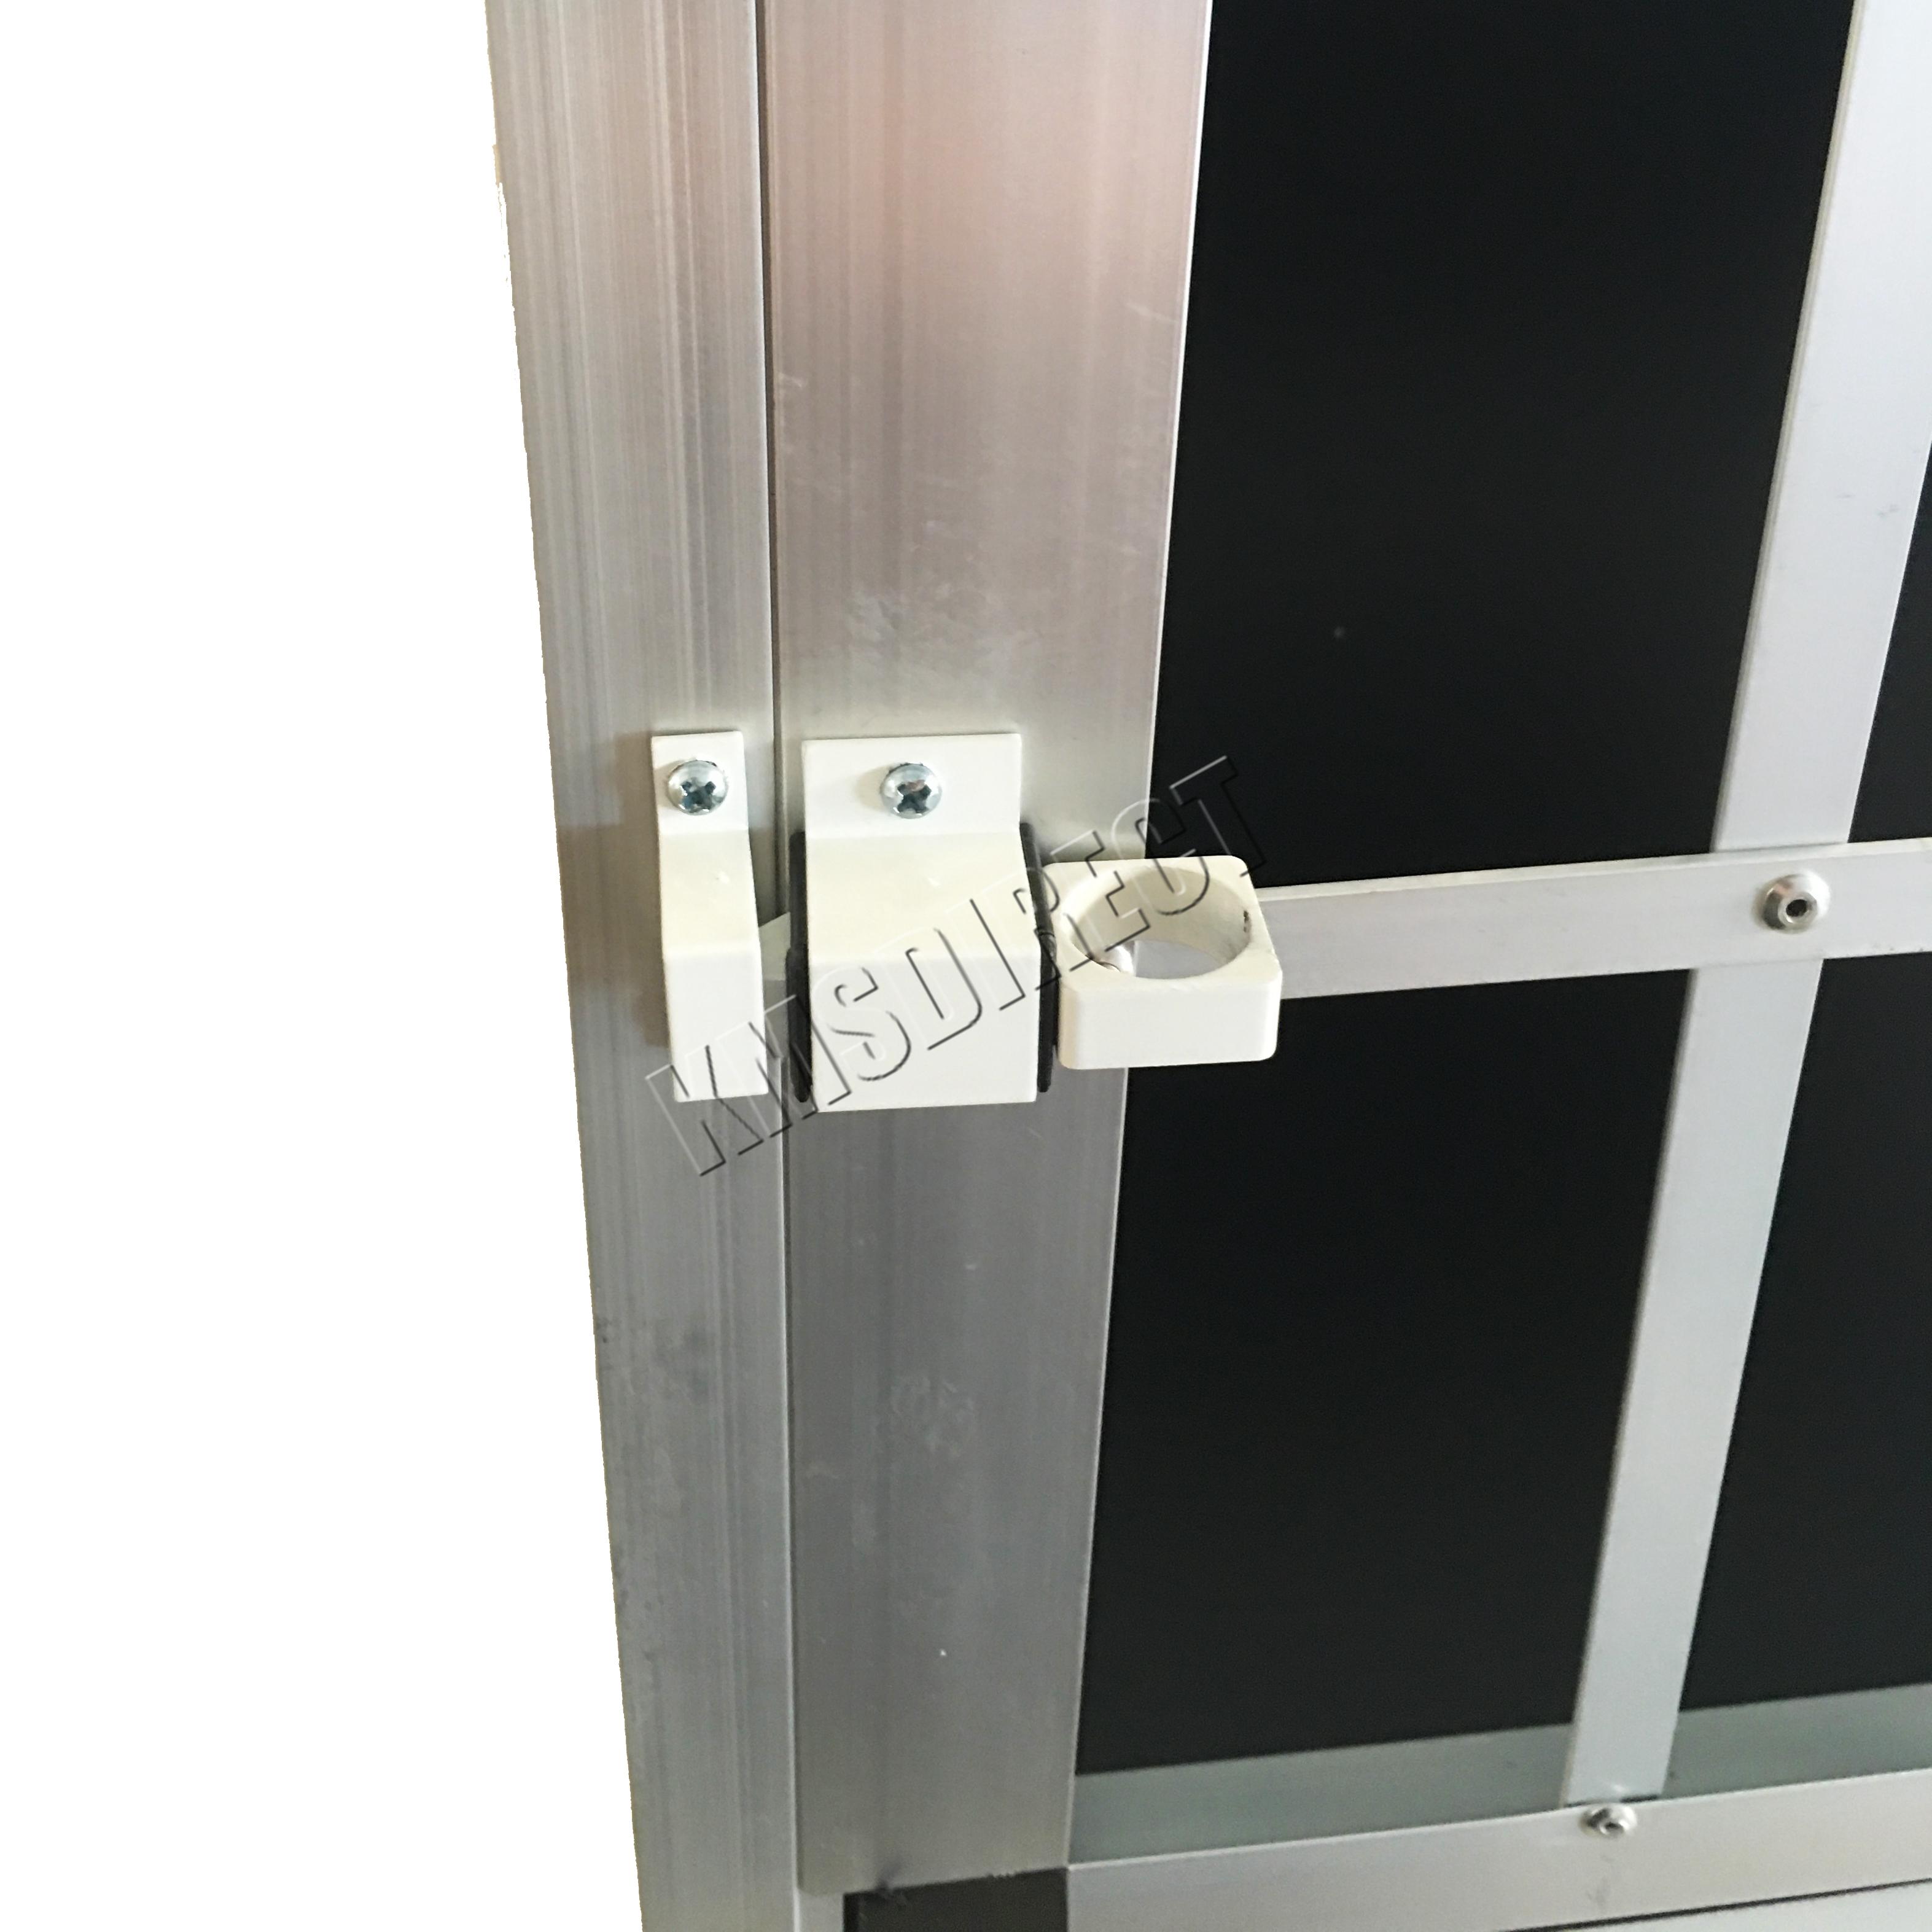 Foxhunter aluminium dog pet cage kennel small transport for Door to door transport